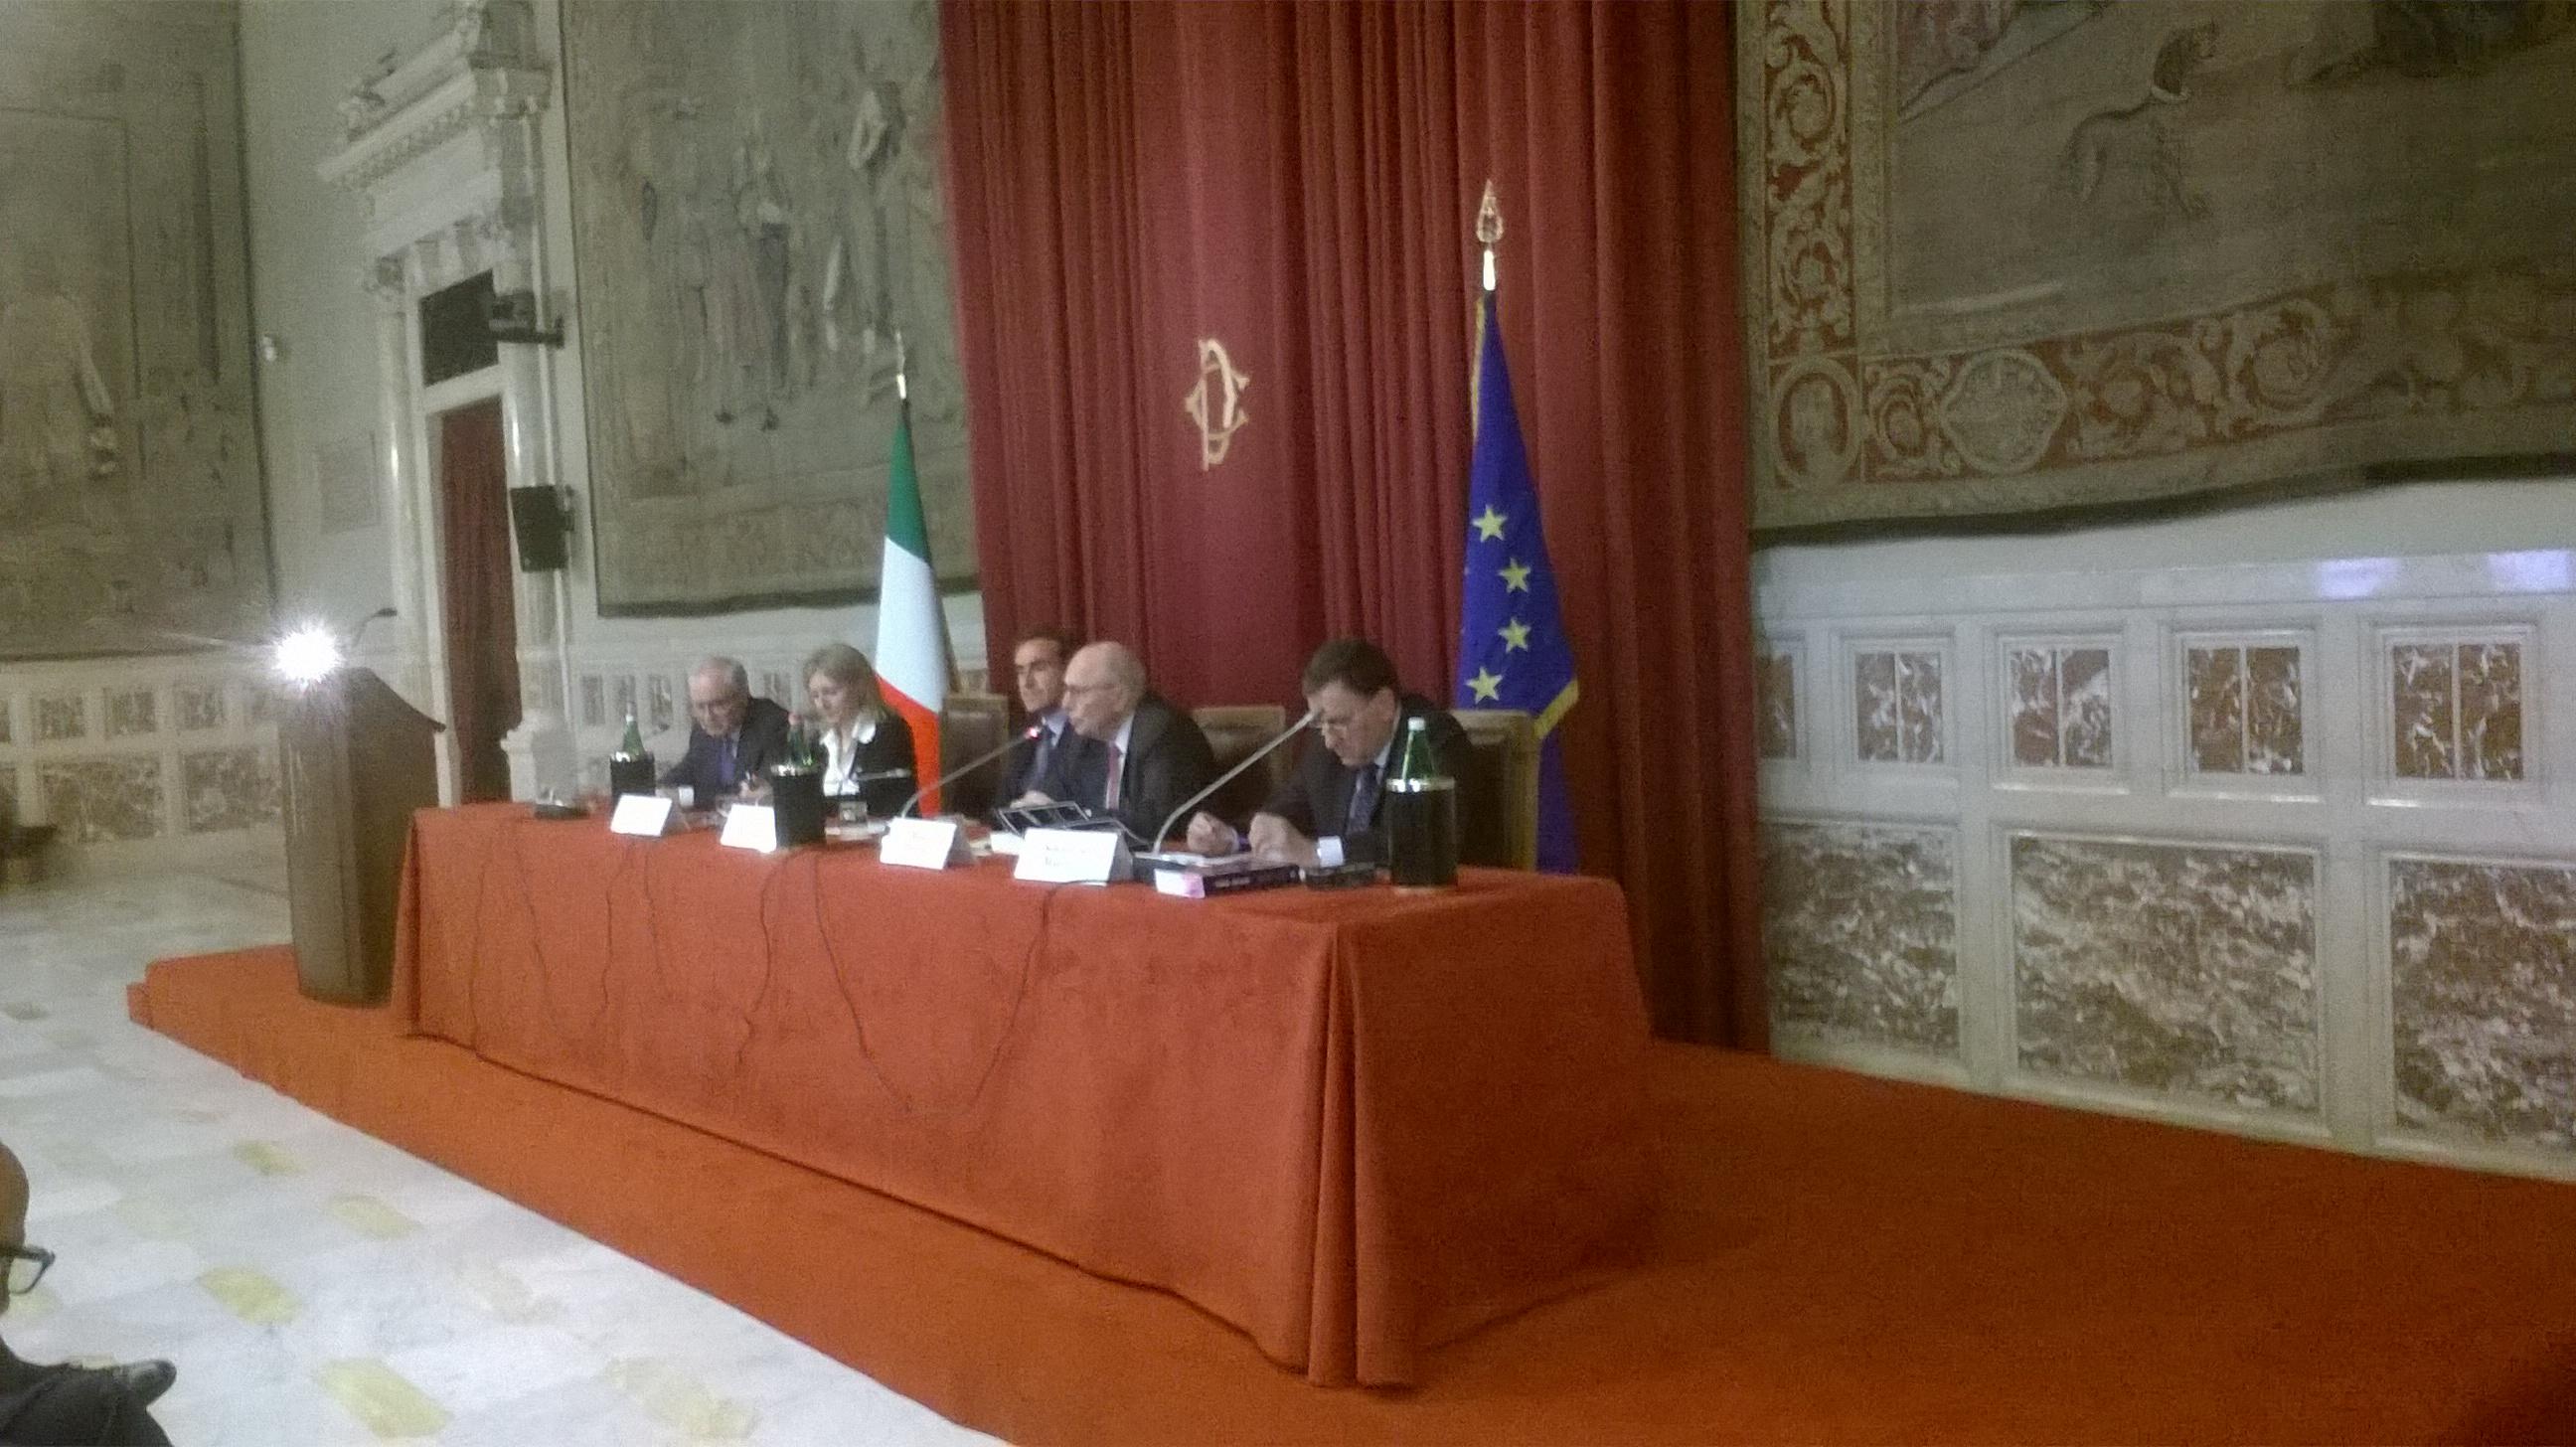 Professor MarioMignoneand Panel addressing the Chamber of Deputies in Queens Hall, Italian Parliament, Rome, Italy. Left to right: FrancoVitelli, GiuliaDell'Aquila, Hon. StefanoDambruoso, MarioMignone, SebastianoMartelli